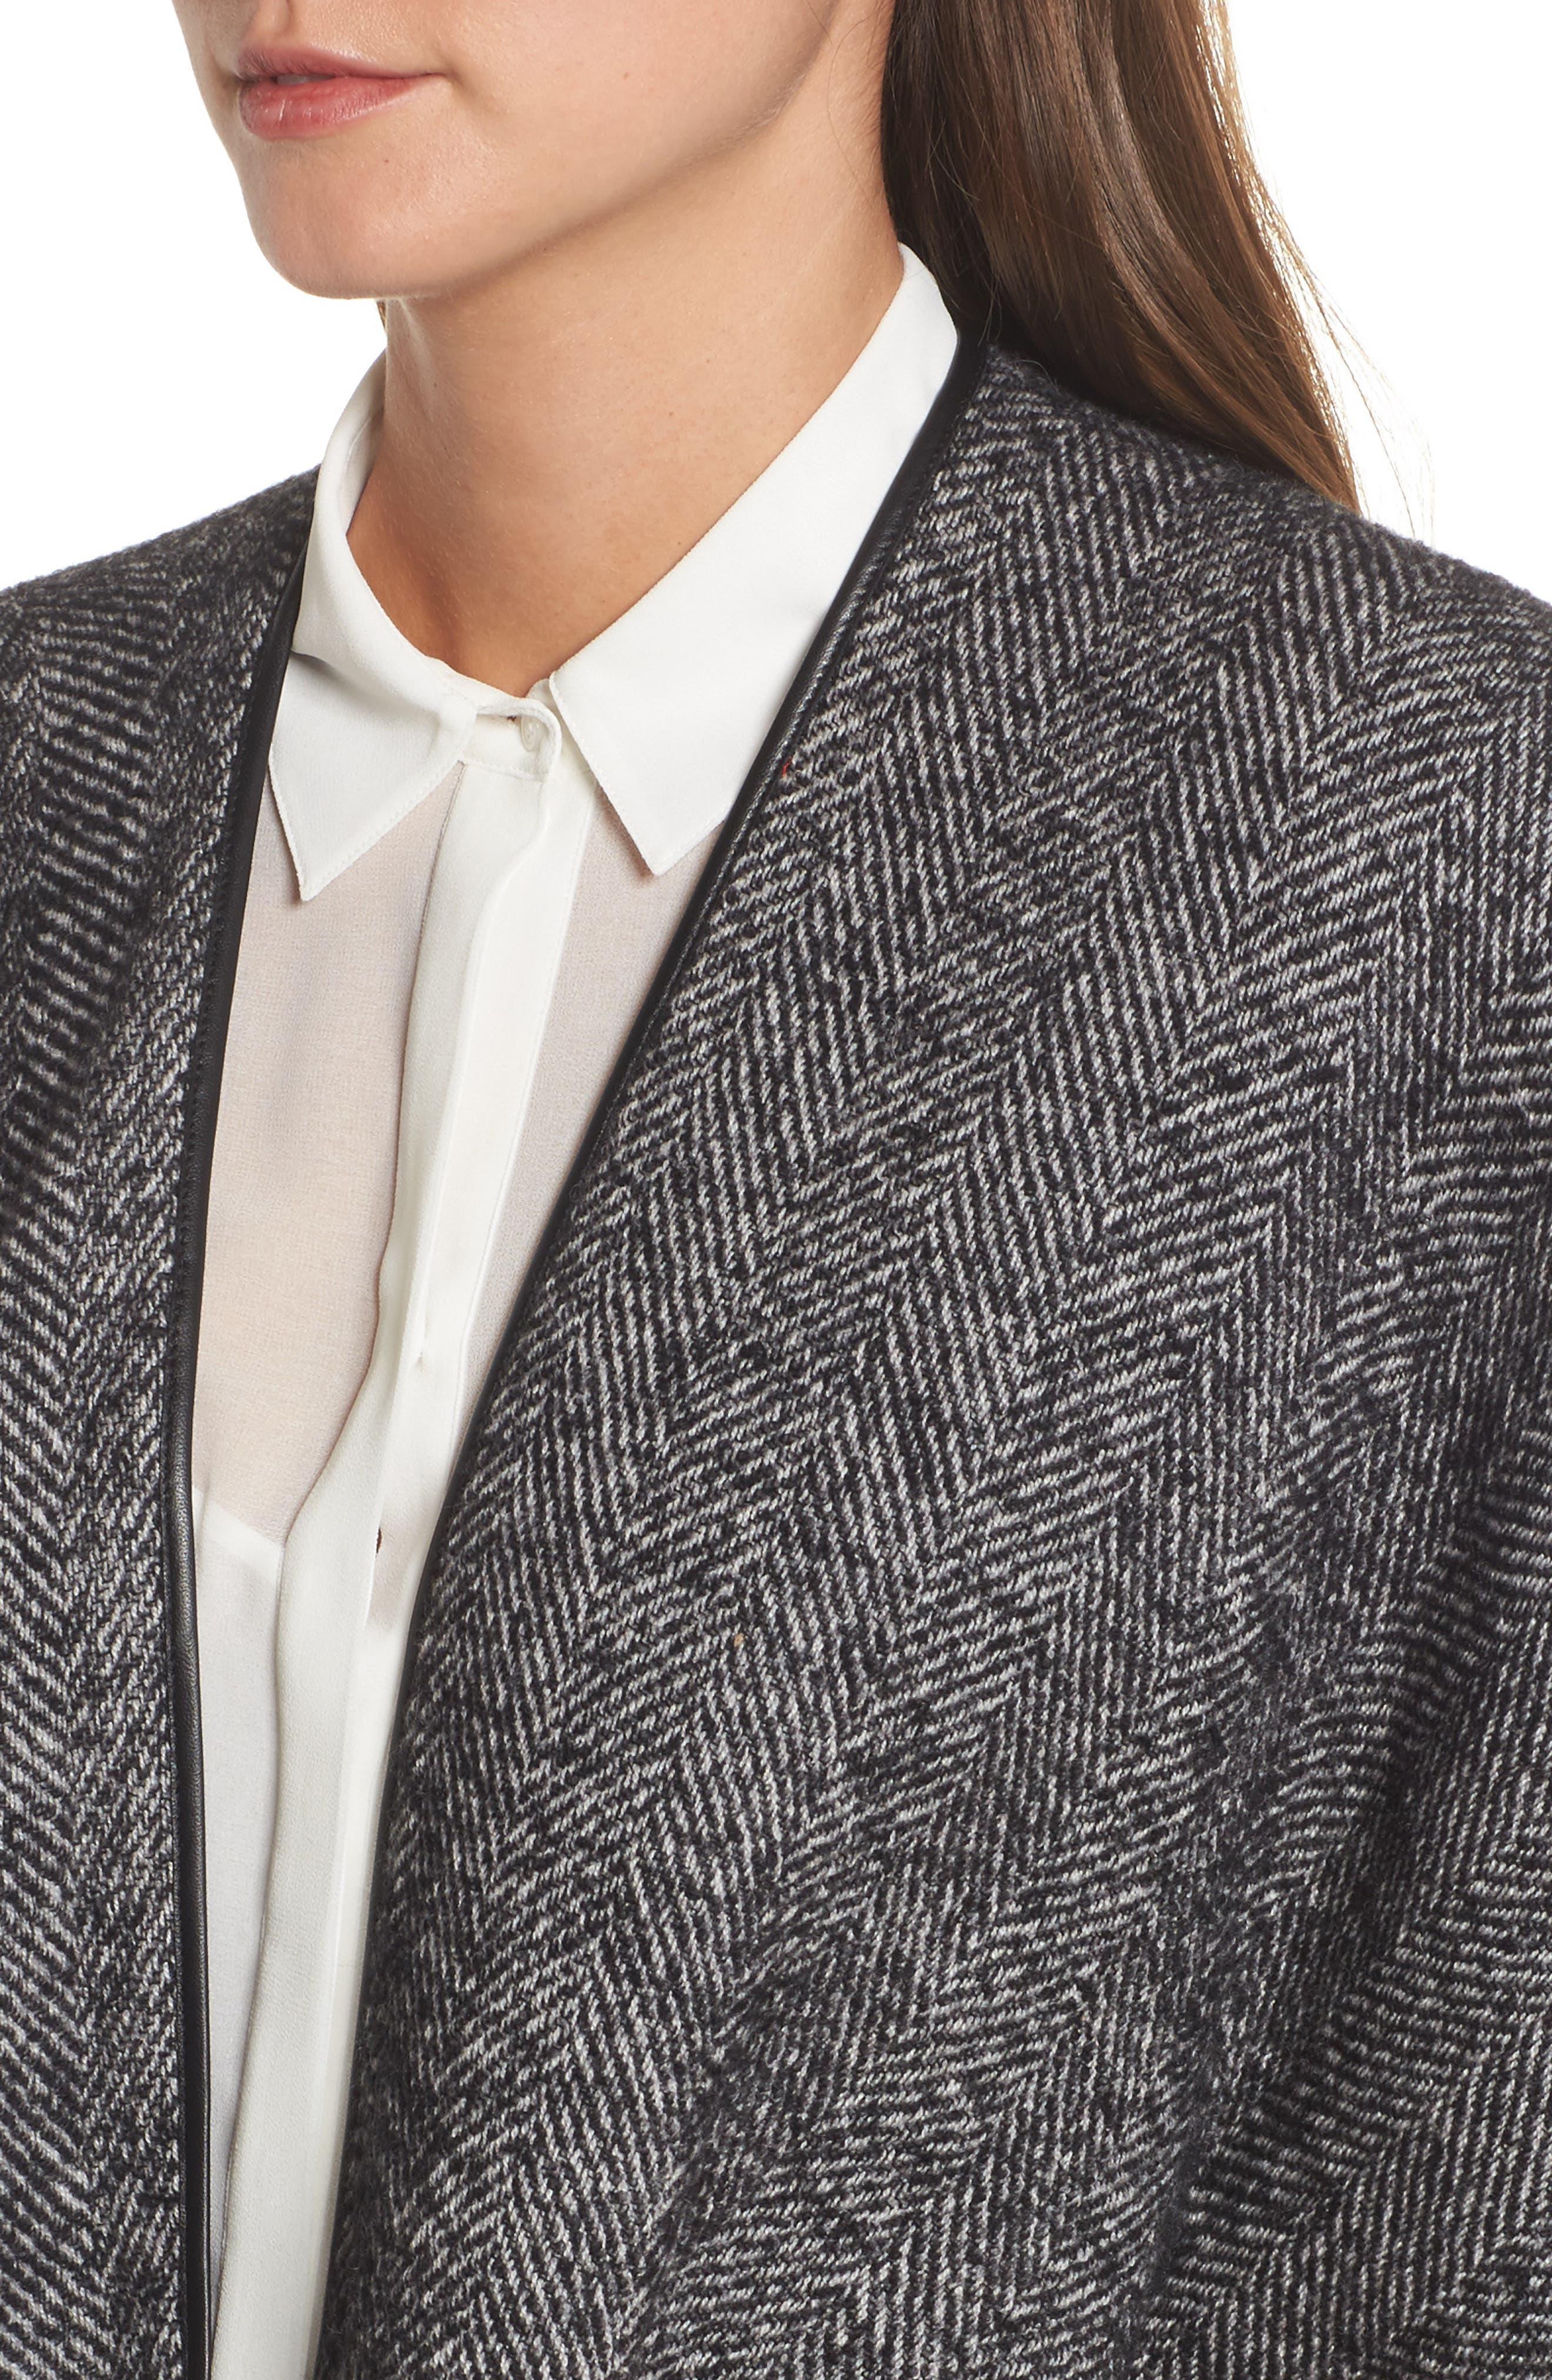 Herringbone Cashmere & Wool Cape,                             Alternate thumbnail 4, color,                             020